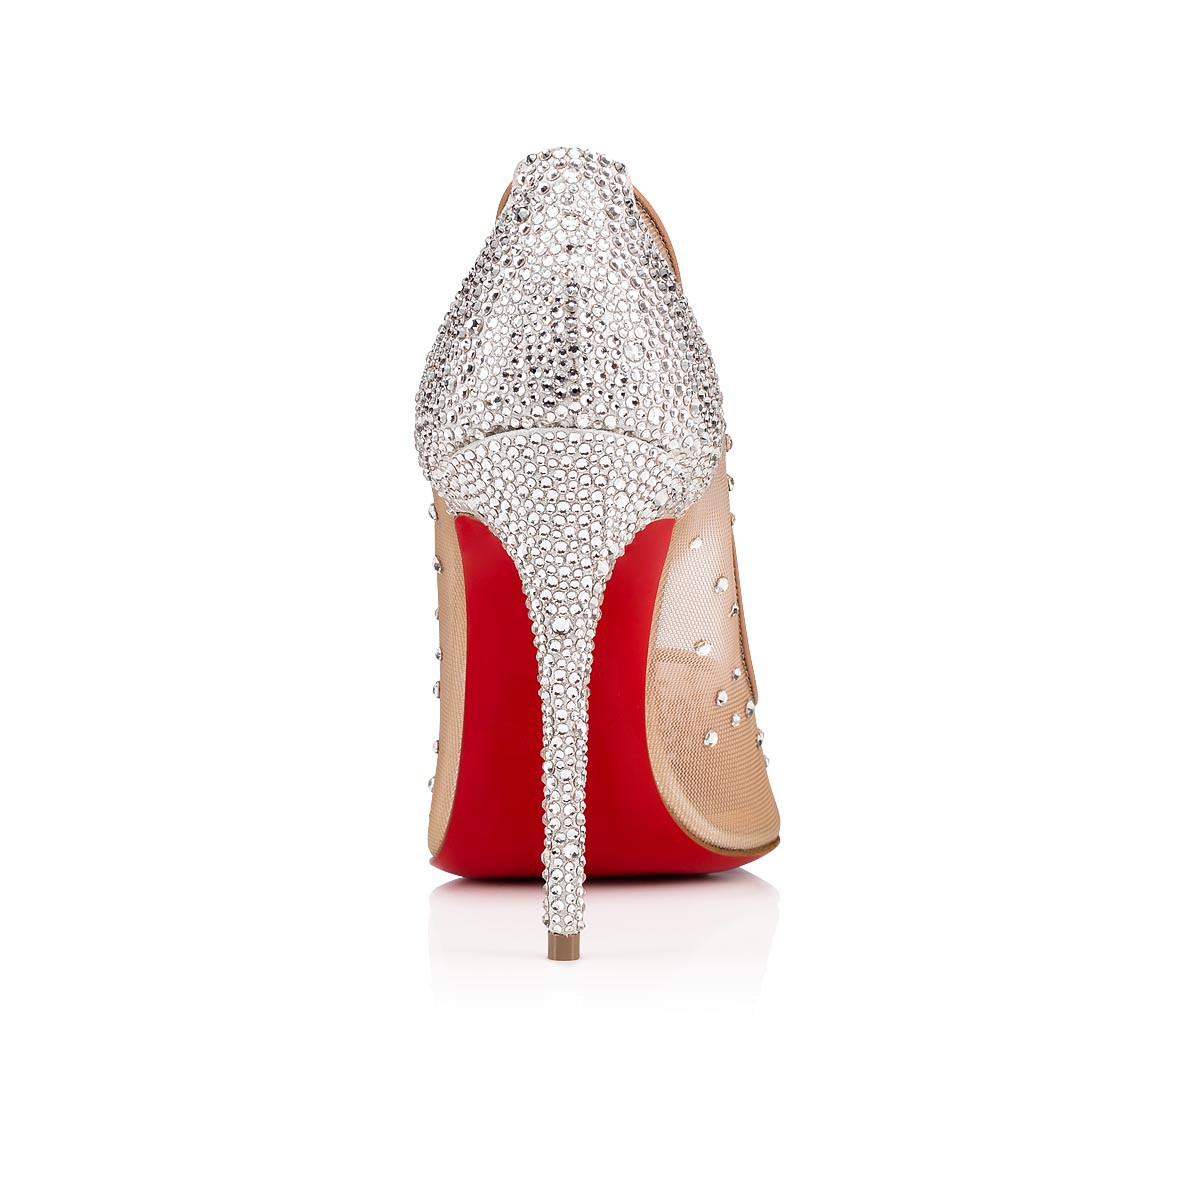 Shoes - Follies Strassita - Christian Louboutin